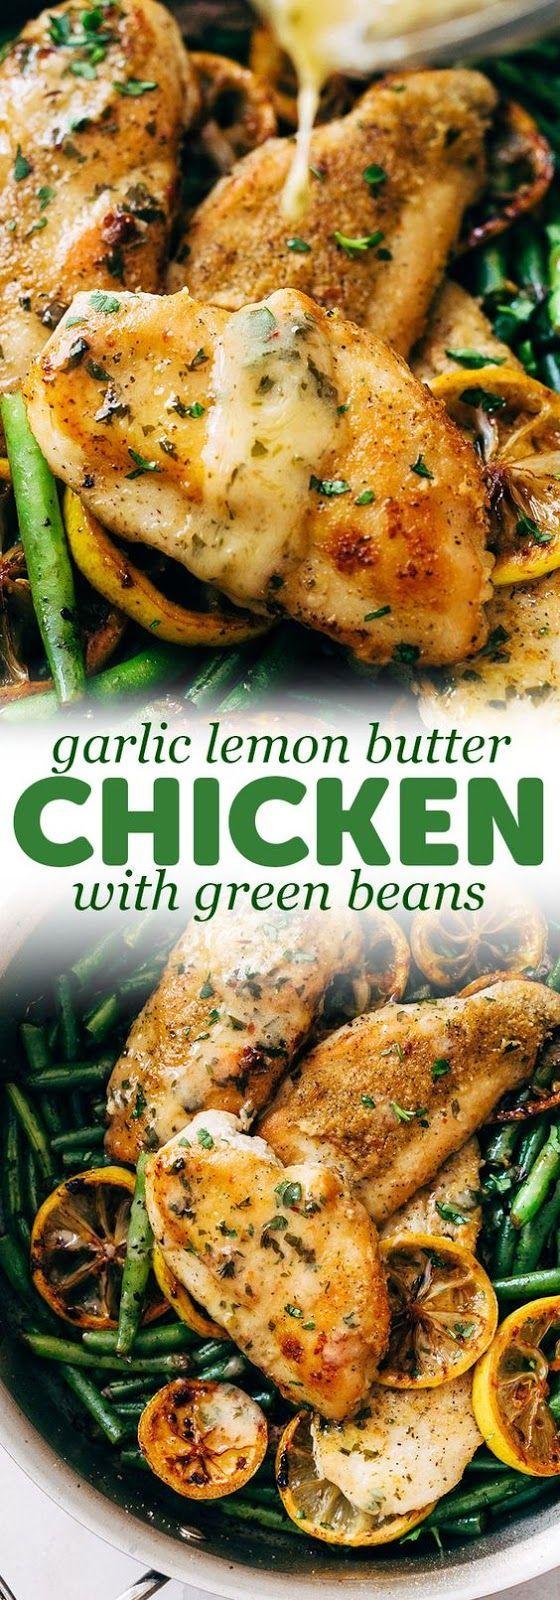 SKILLET GARLIC LEMON BUTTER CHICKEN  Chicken  ChickenRecipes  LemonButterChicken | Recipes News